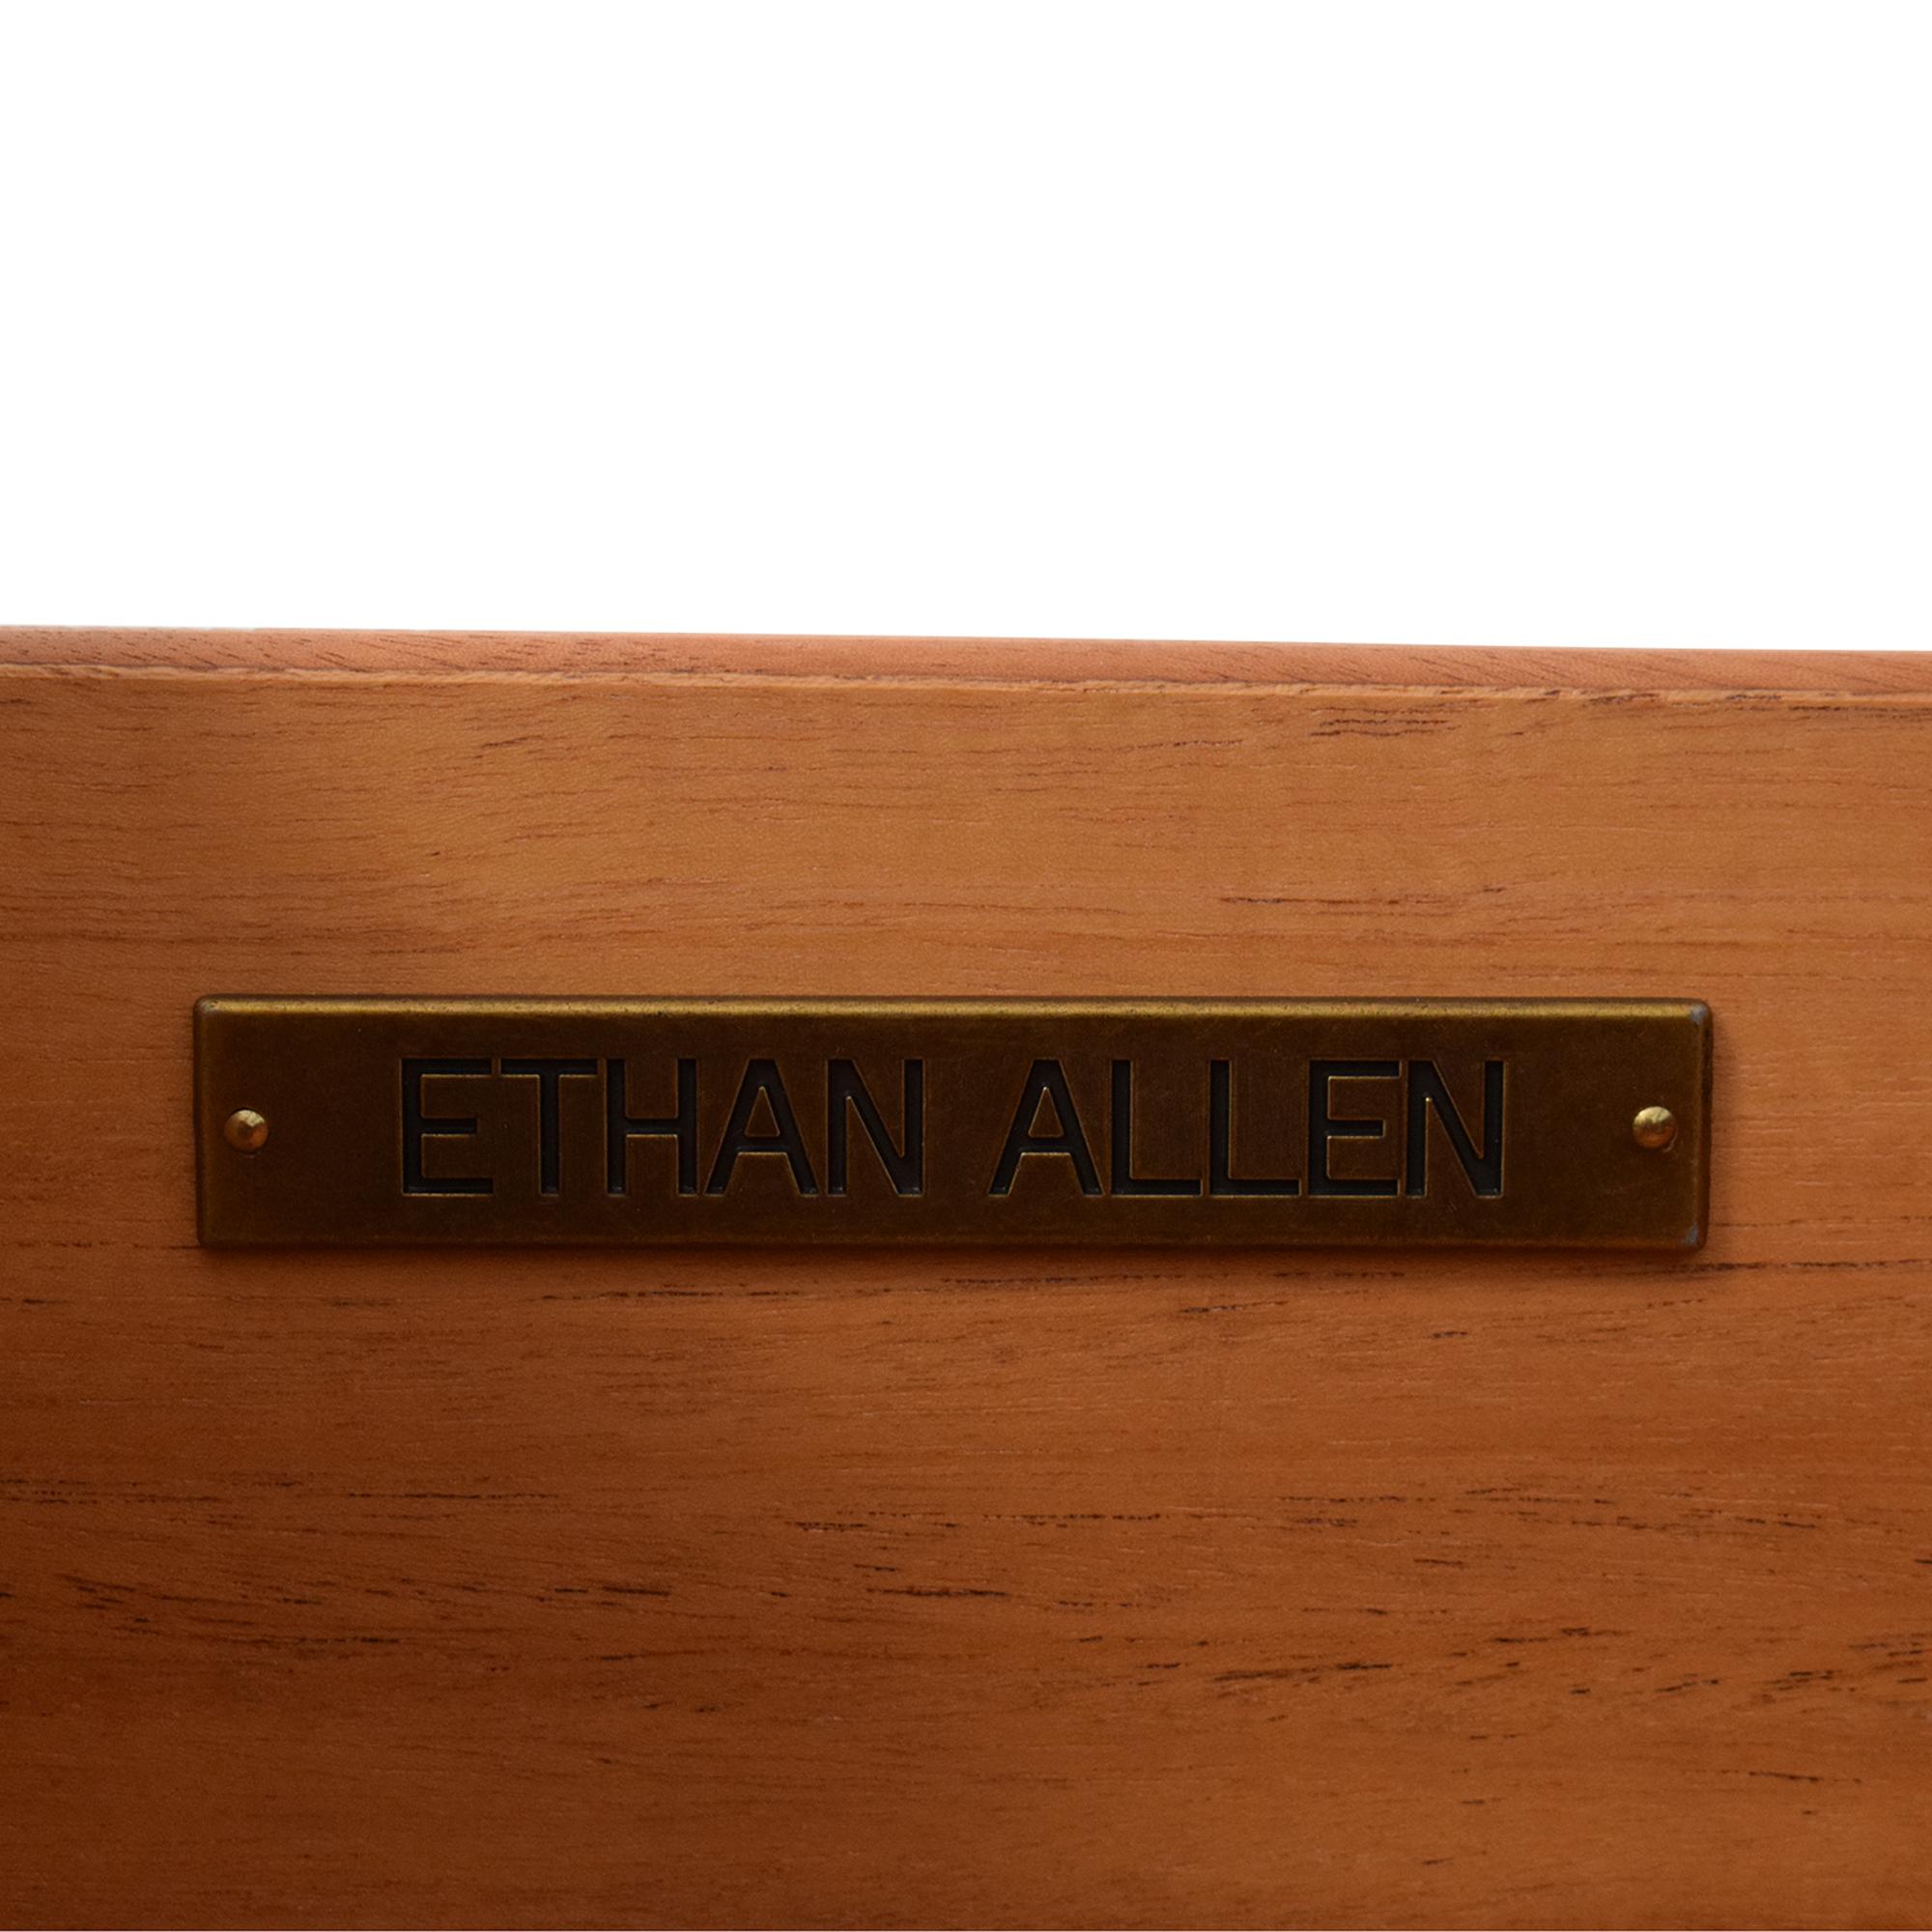 Ethan Allen Ethan Allen Merrick Night Table dimensions